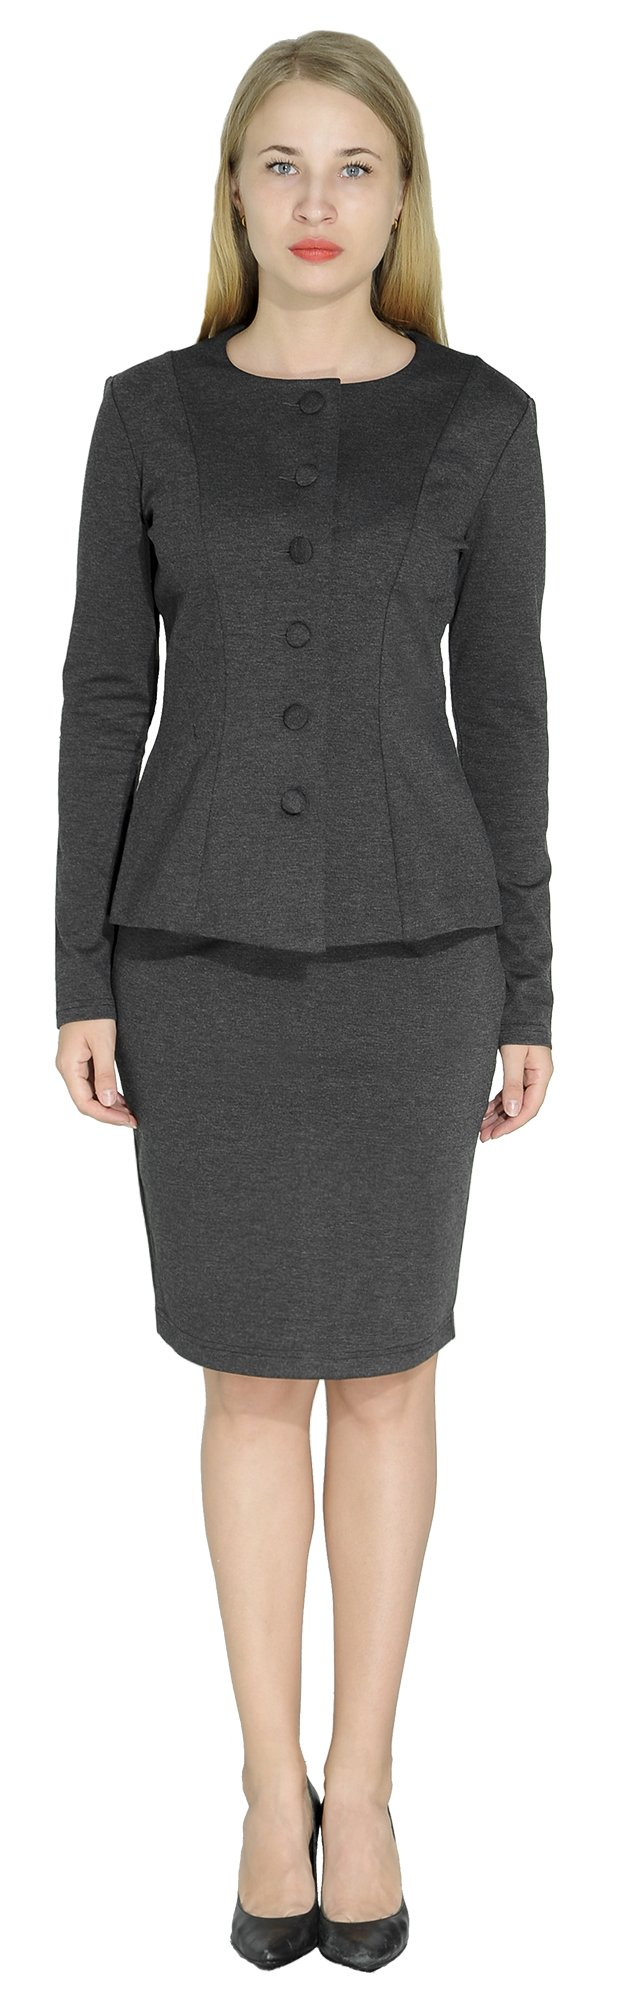 Marycrafts Women's Formal Office Business Work Skirt Suit Set 14 Dark Gray